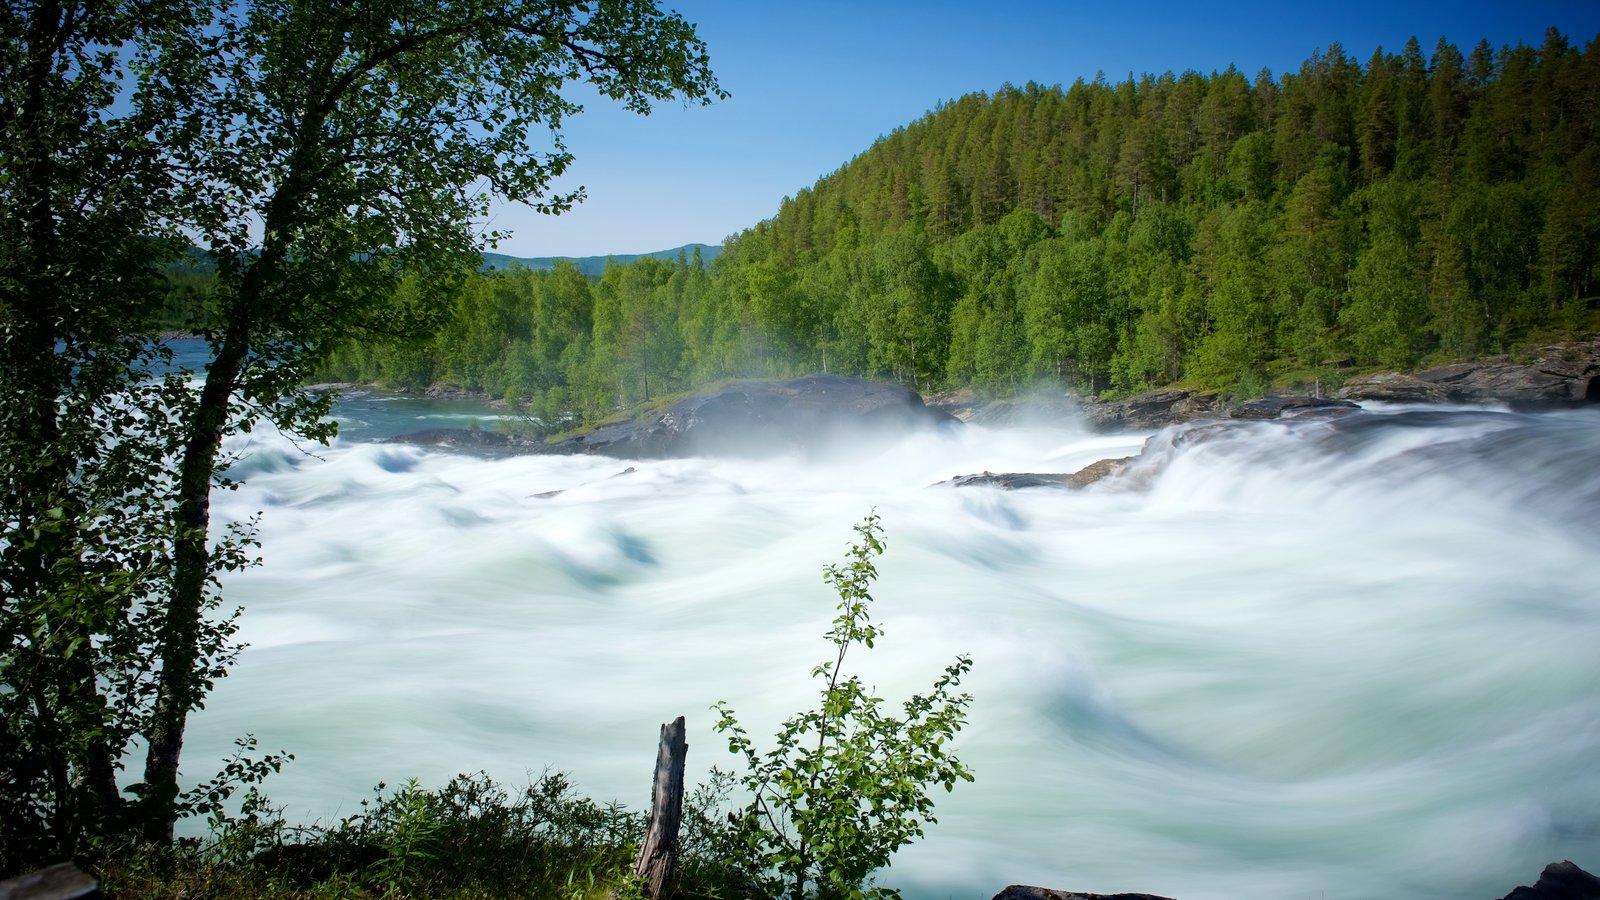 Maalselvfossen Waterfall featuring rapids and forest scenes